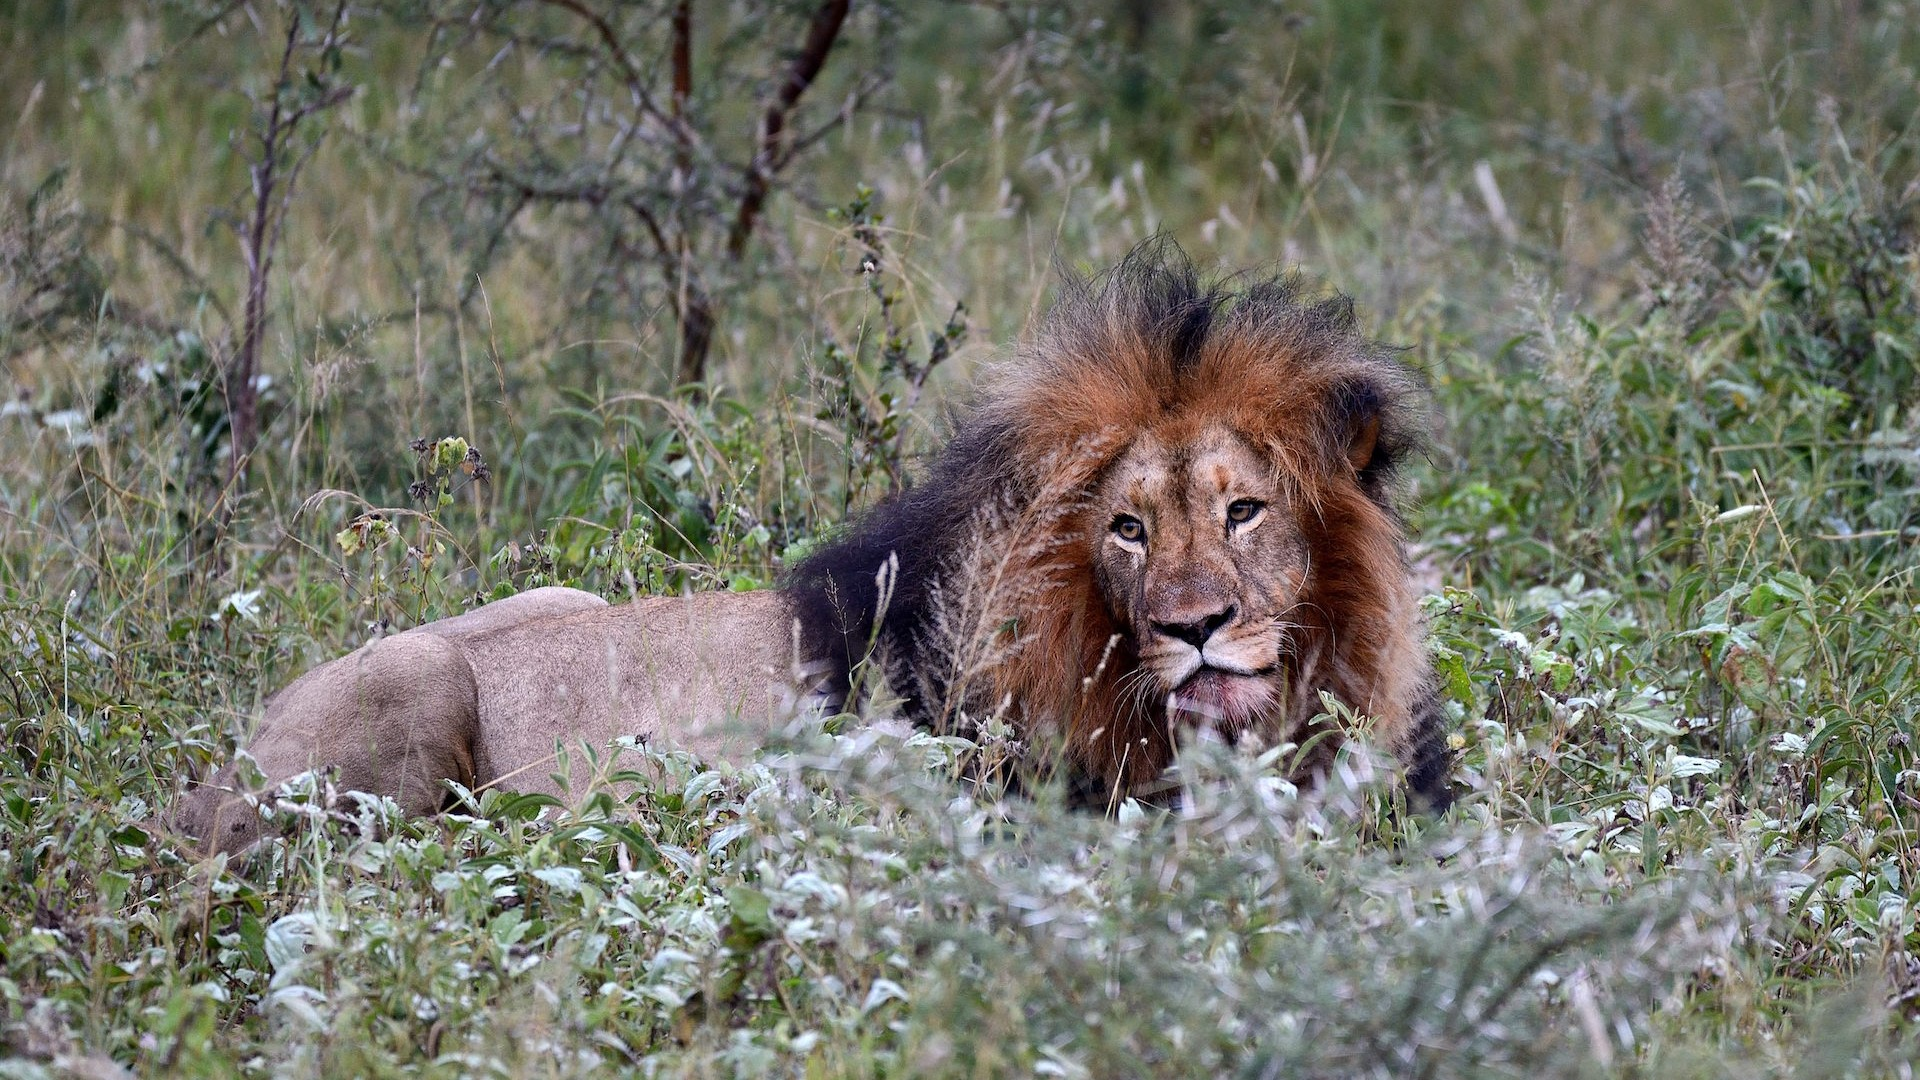 Lions ate a poacher